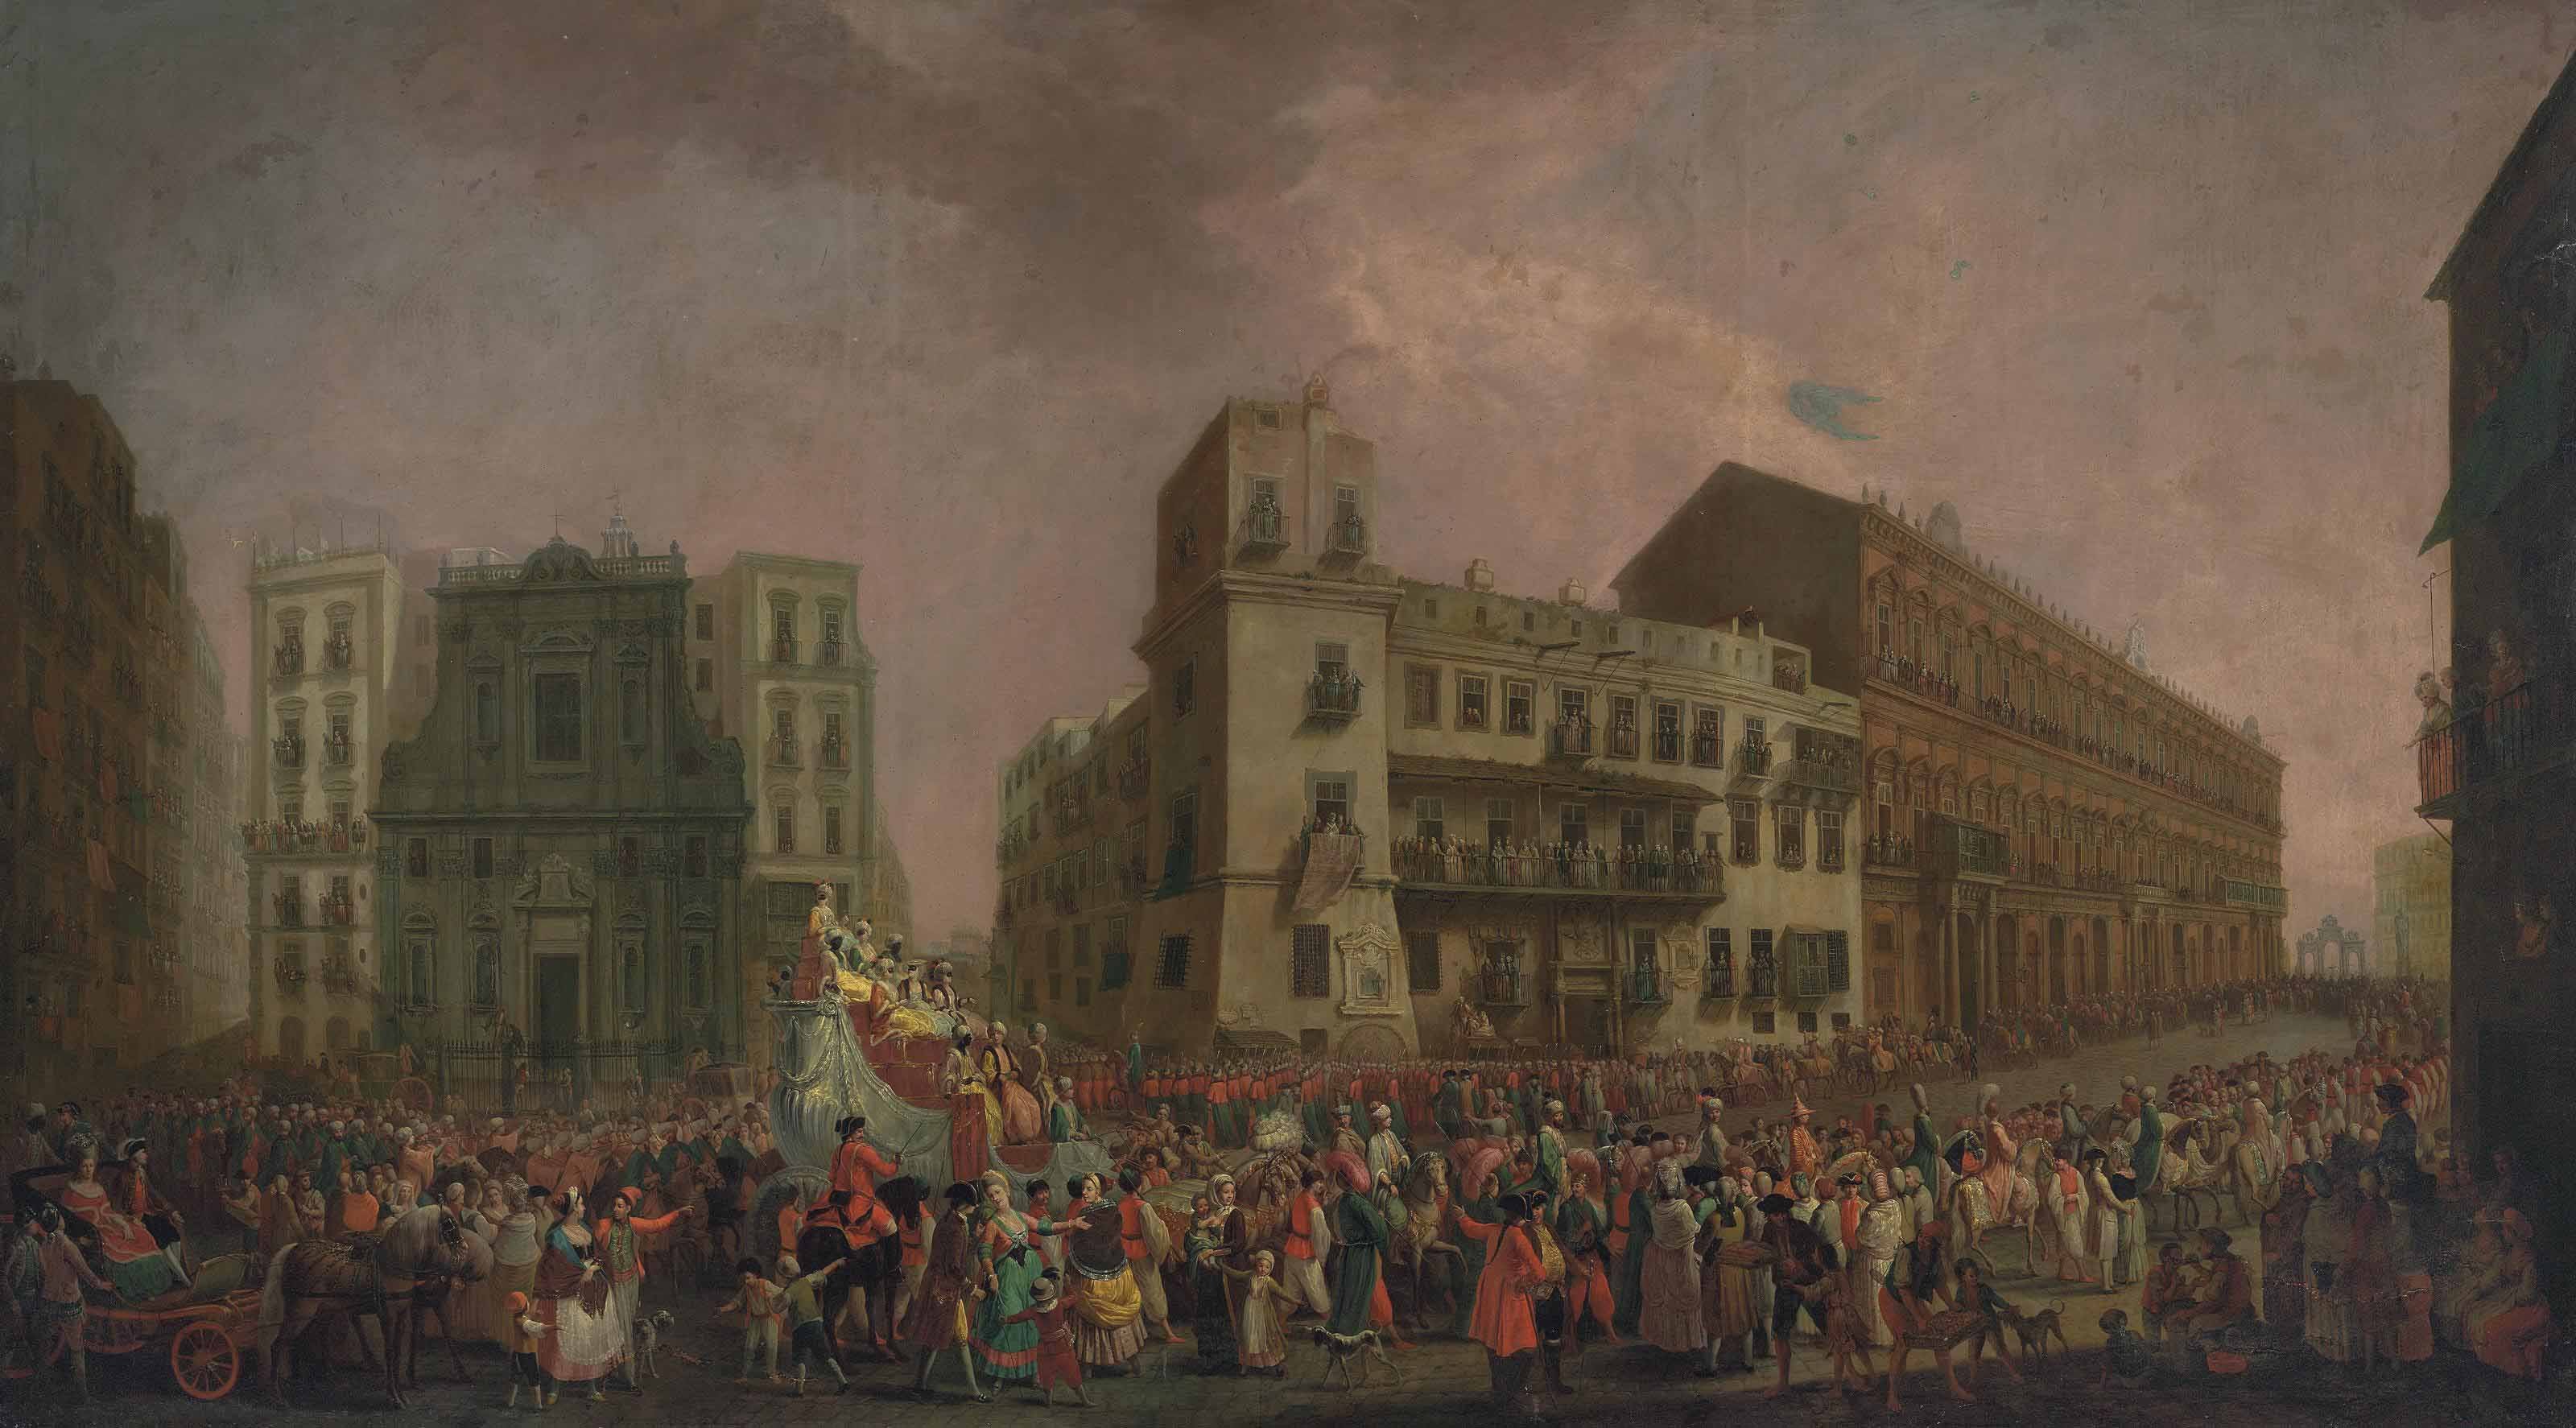 The Carnival in Naples in 1778, with the 'Cavalcata turca' parading through the Largo di Palazzo